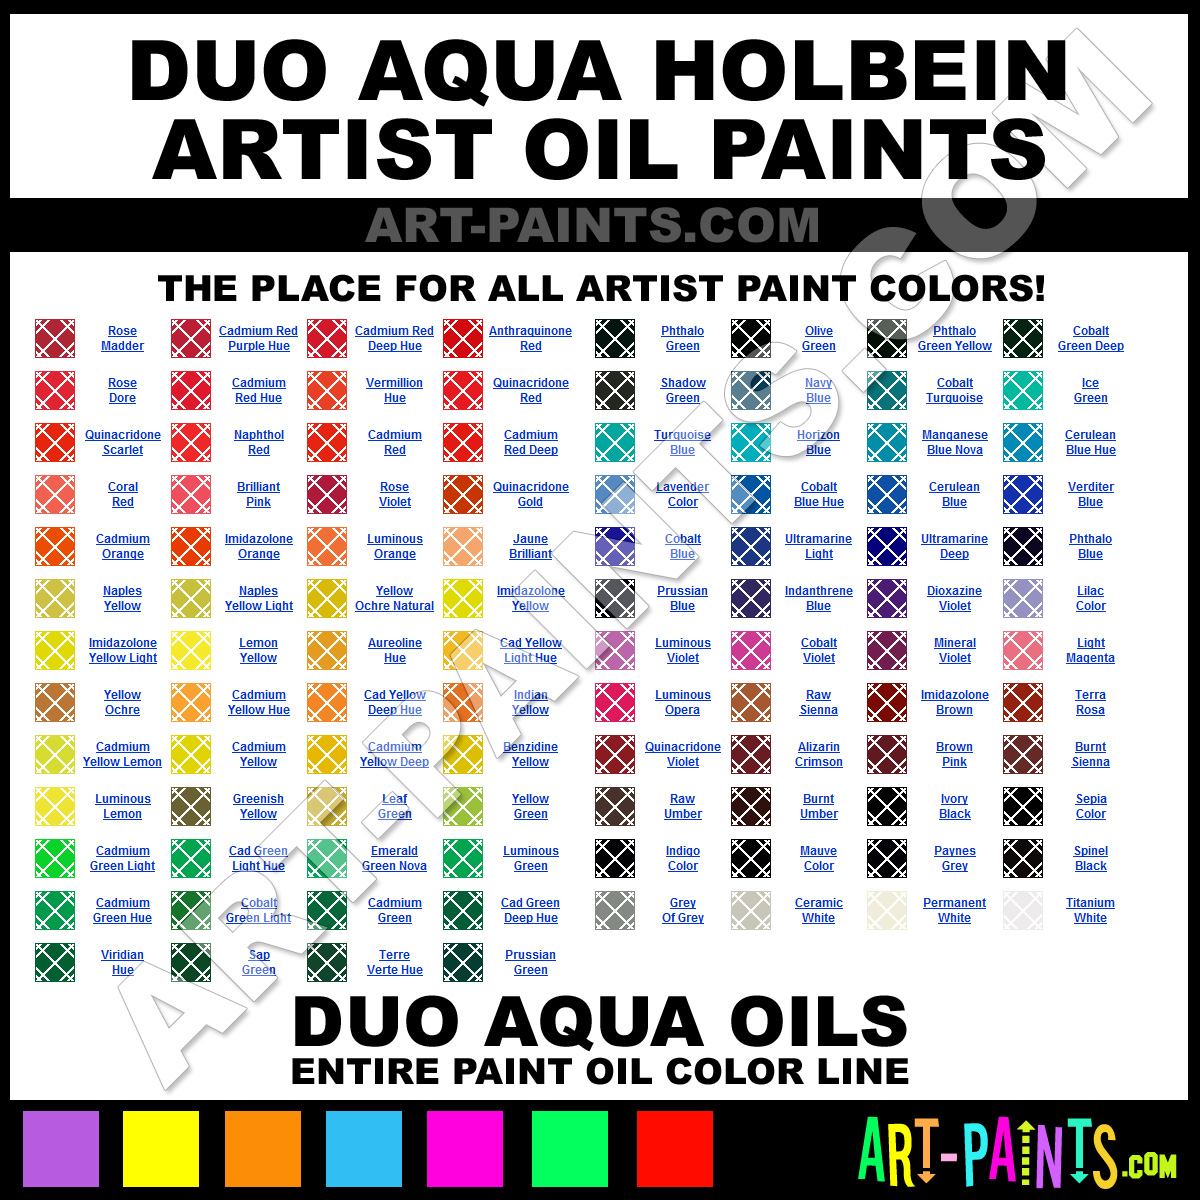 Holbein Duo Aqua Color Chart Duo Aqua Holbein Paints